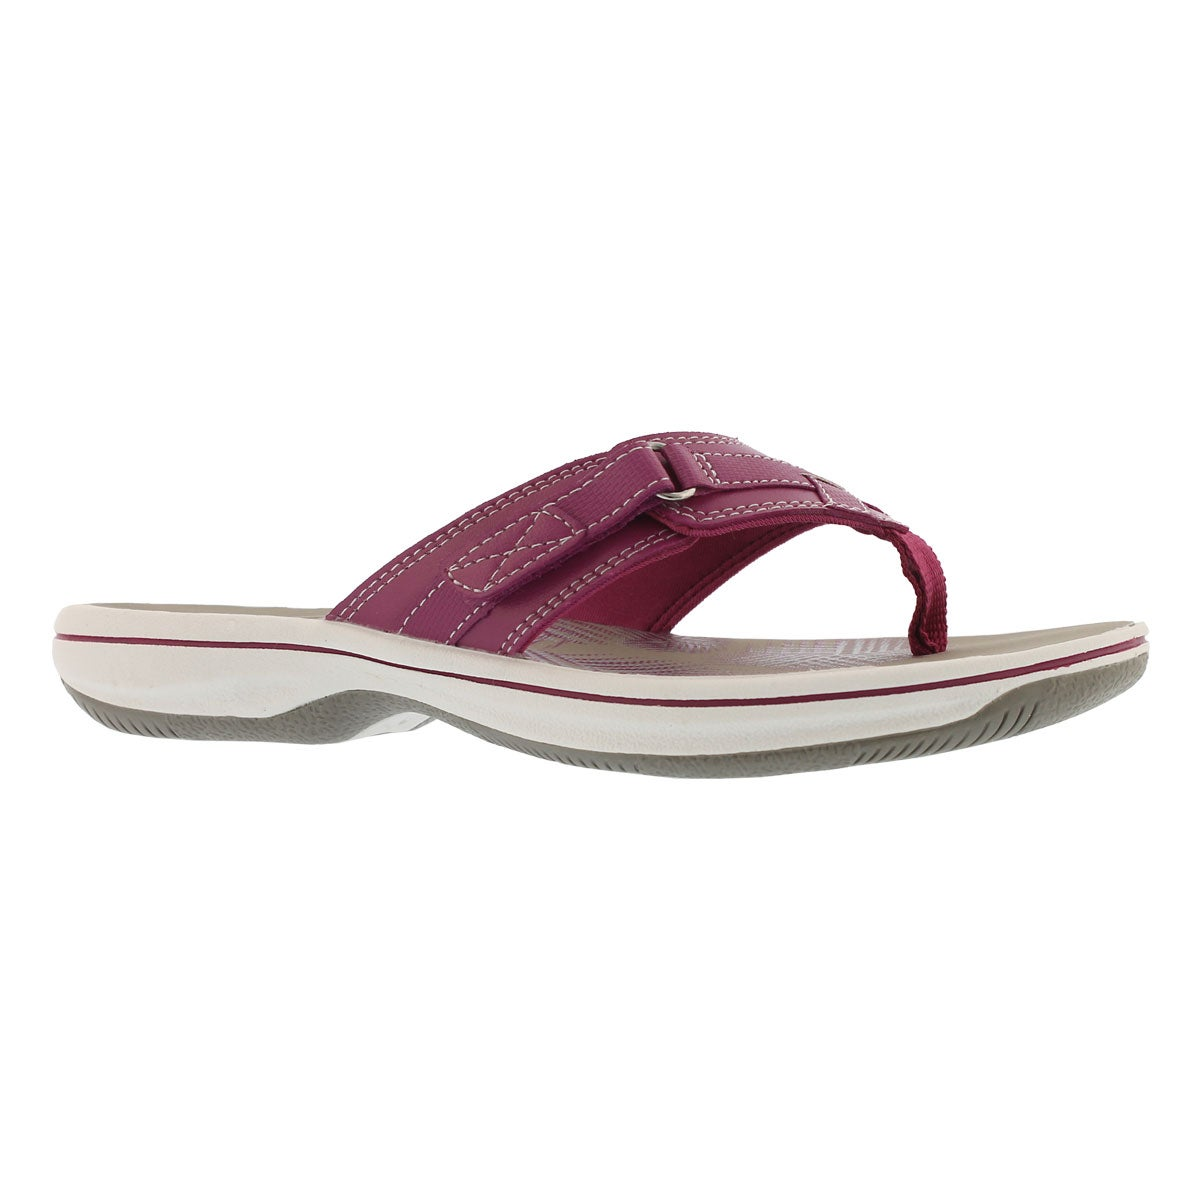 Women's BREEZE SEA magenta thong sandals